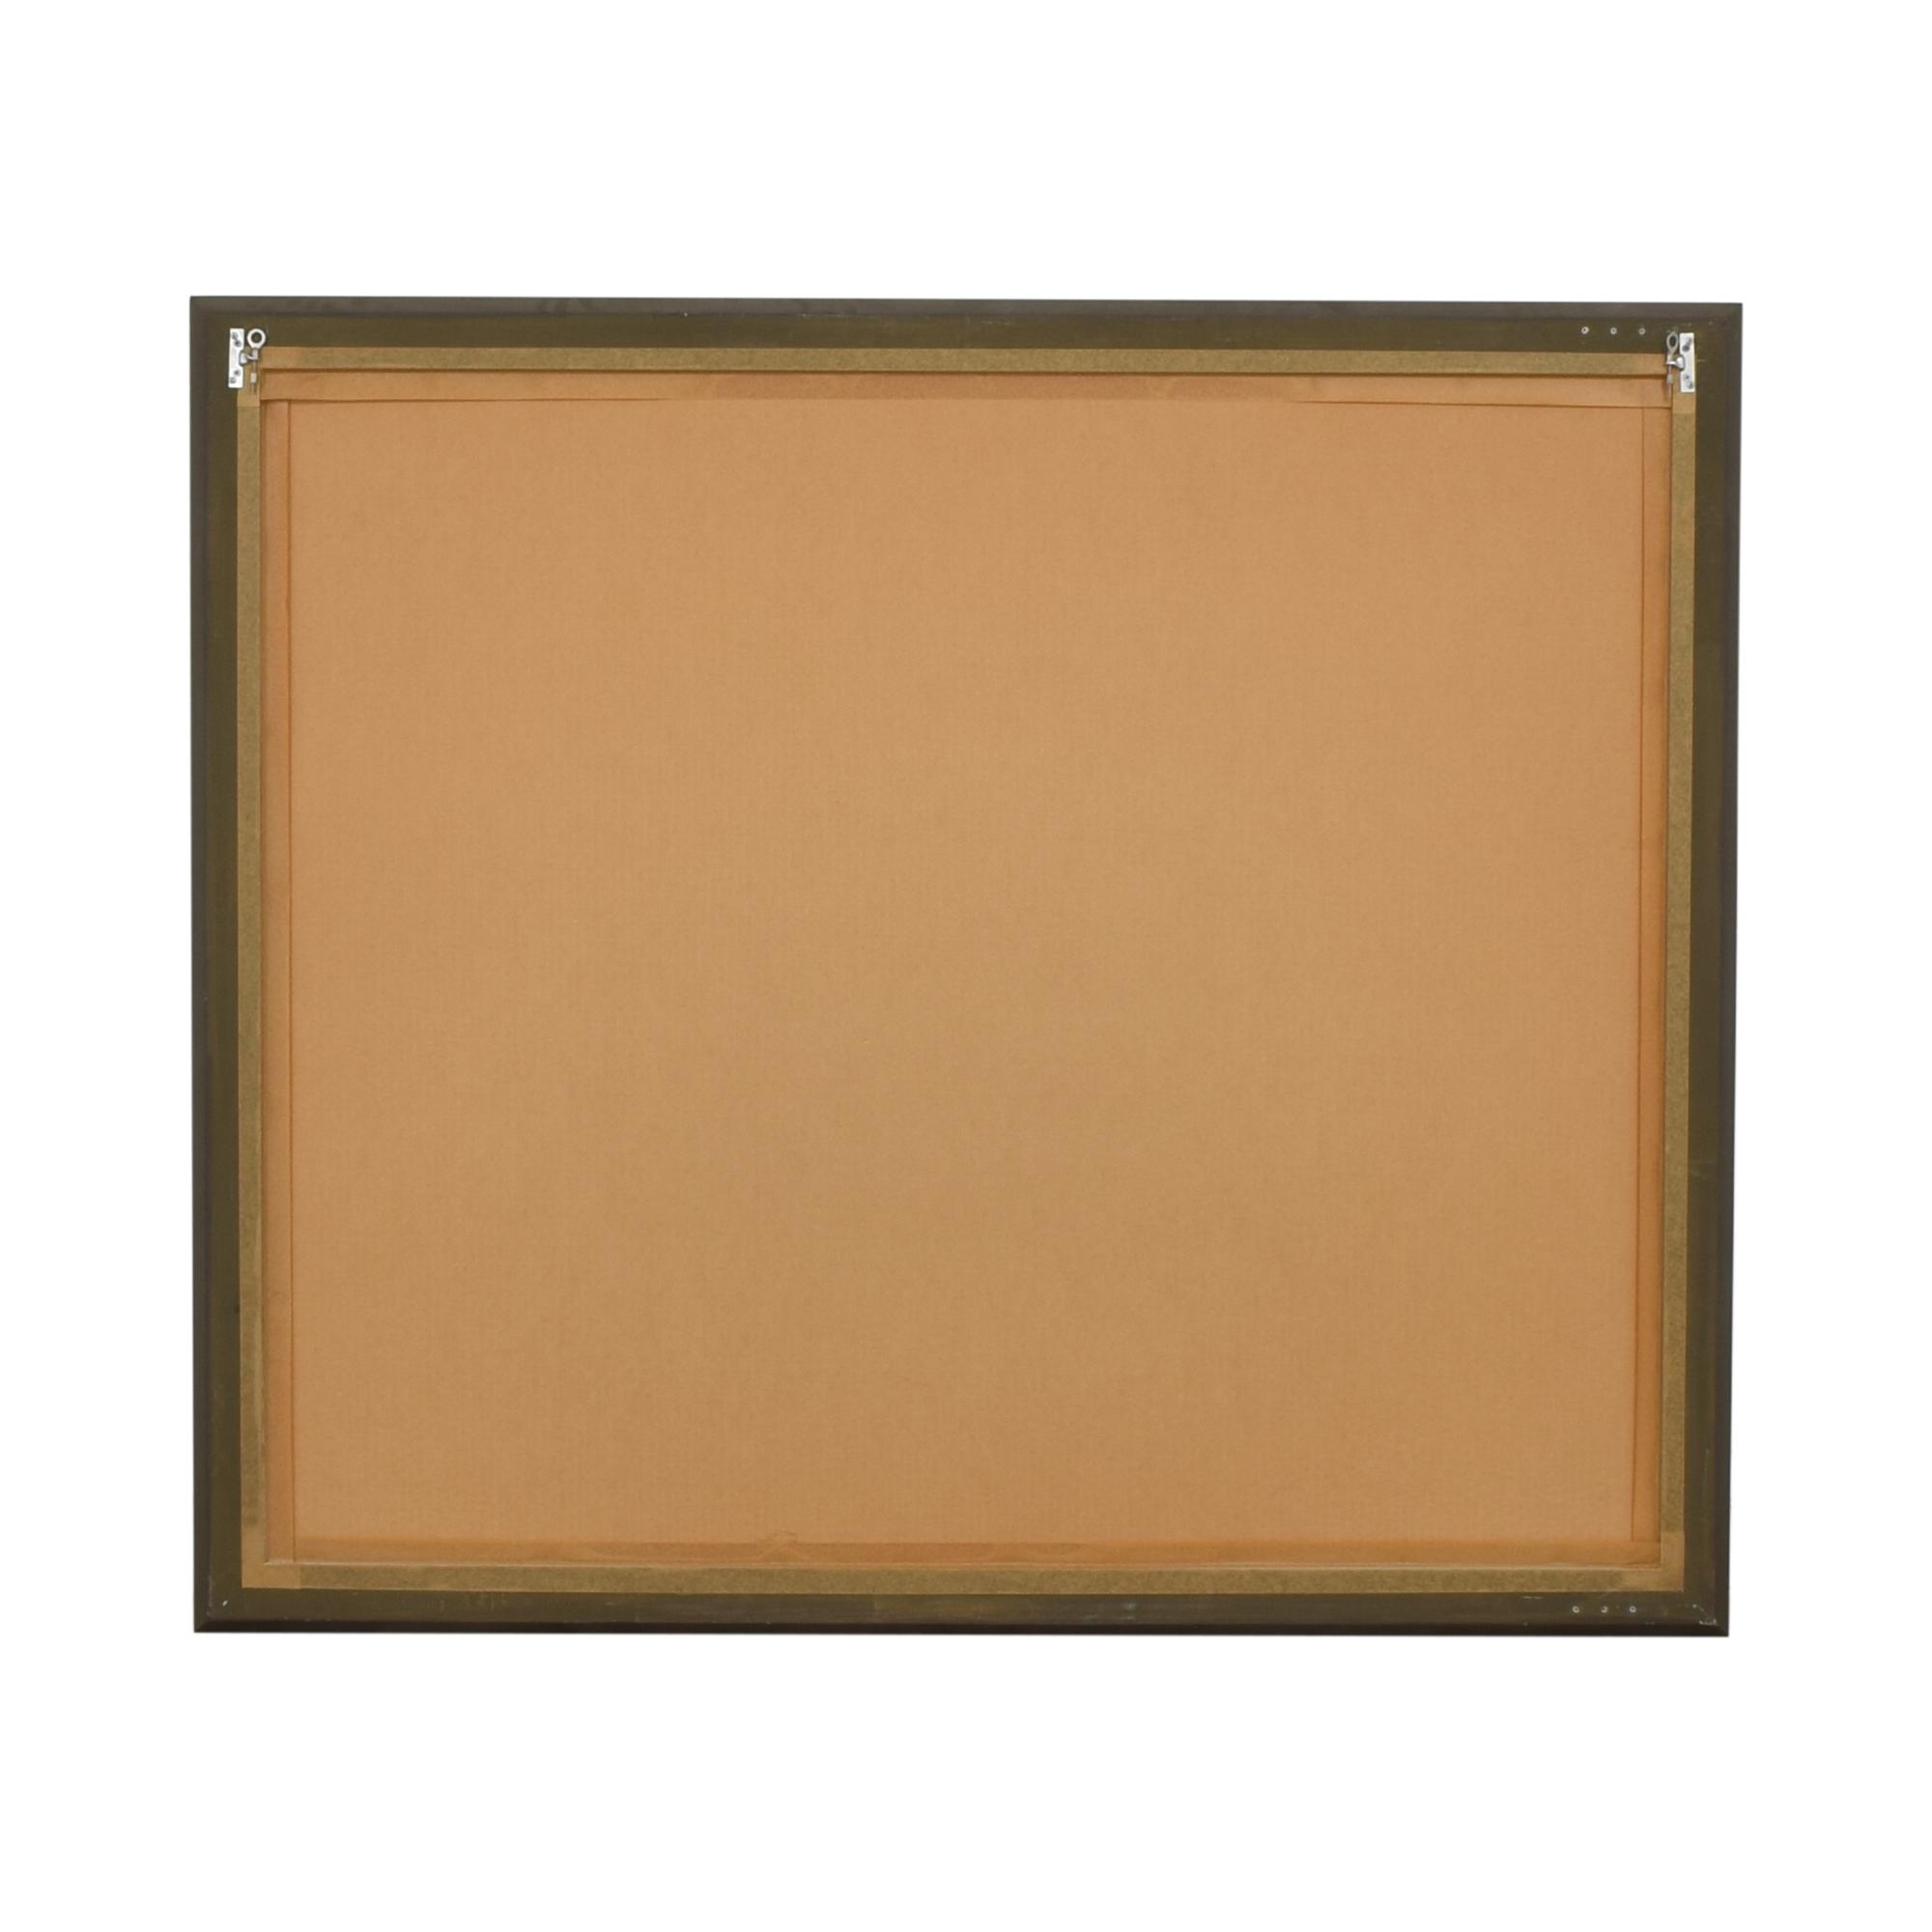 buy Framed Decorative Wall Mirror